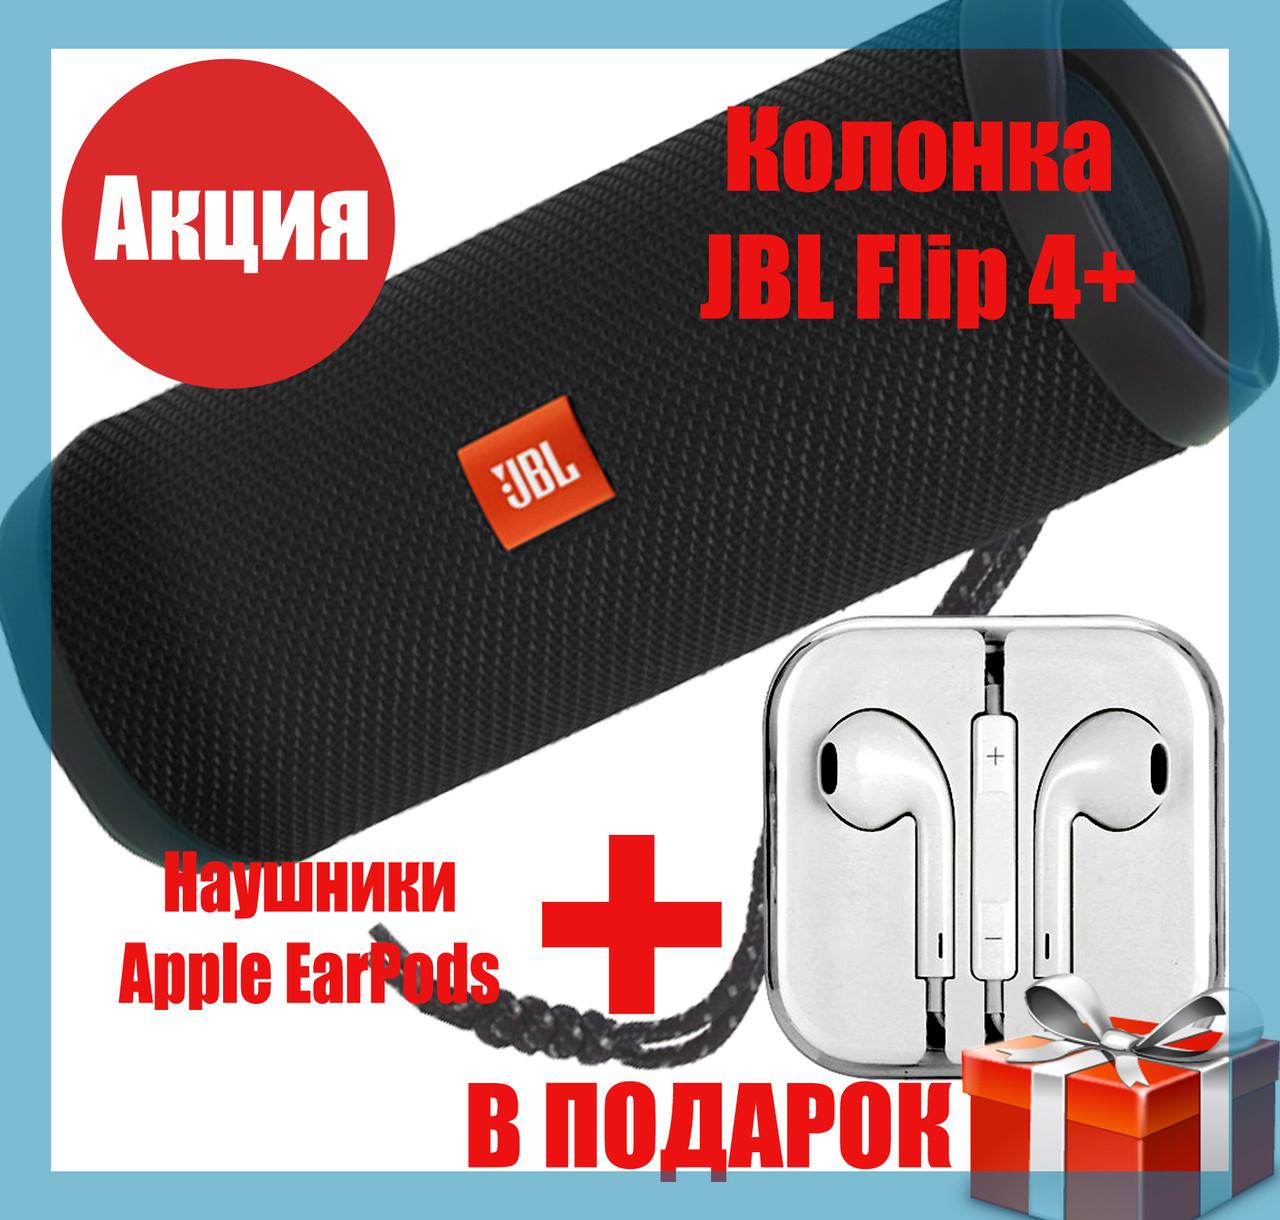 JBL Flip 4 Портативная Bluetooth колонка влагозащита, microSD,MP3,MP4,FM,USB 20W QualitiReplica